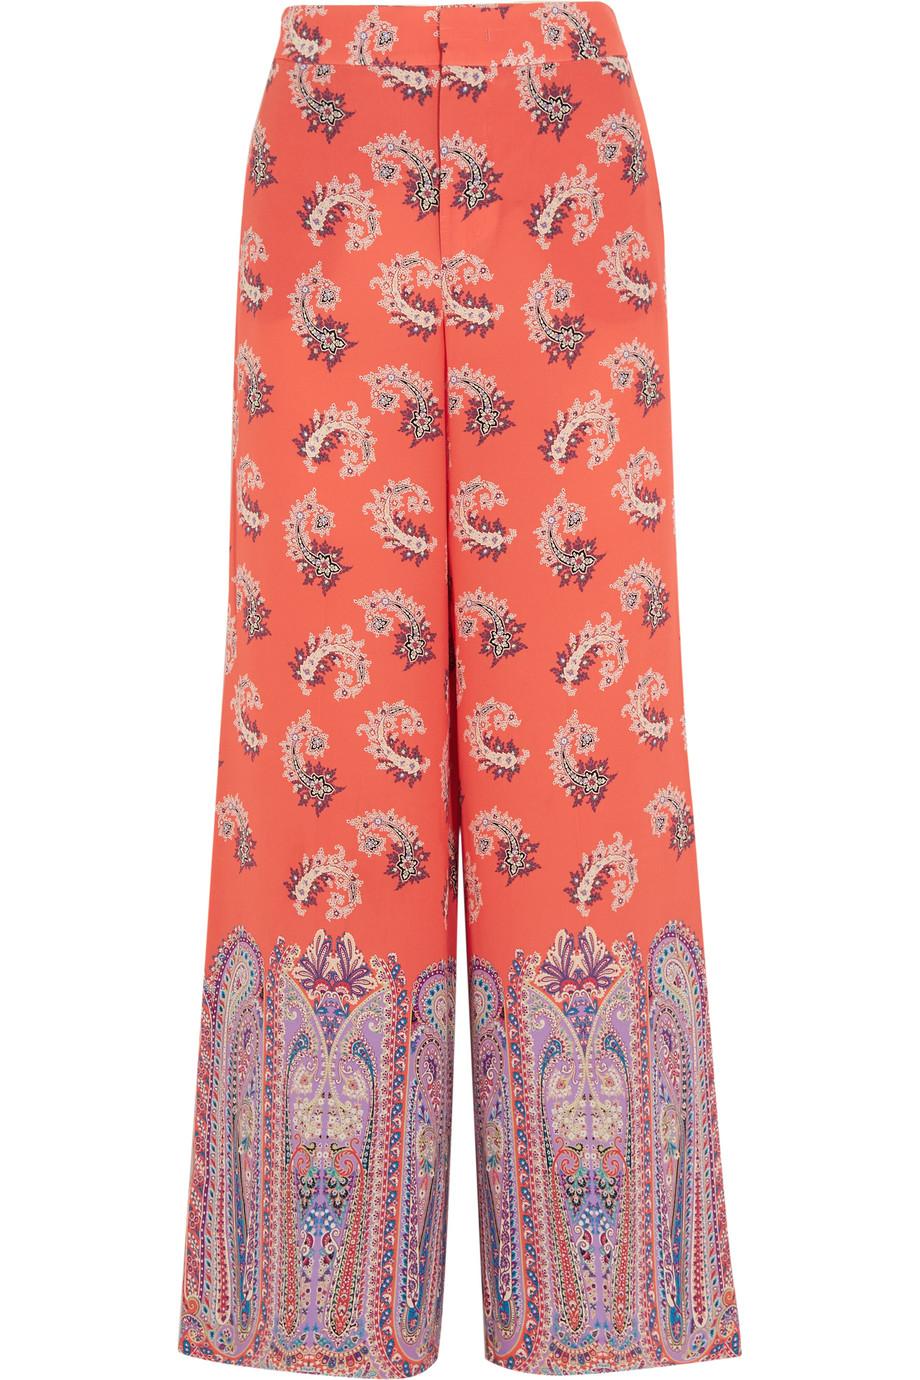 Etro Printed Silk Crepe De Chine Wide-Leg Pants, Size: 48